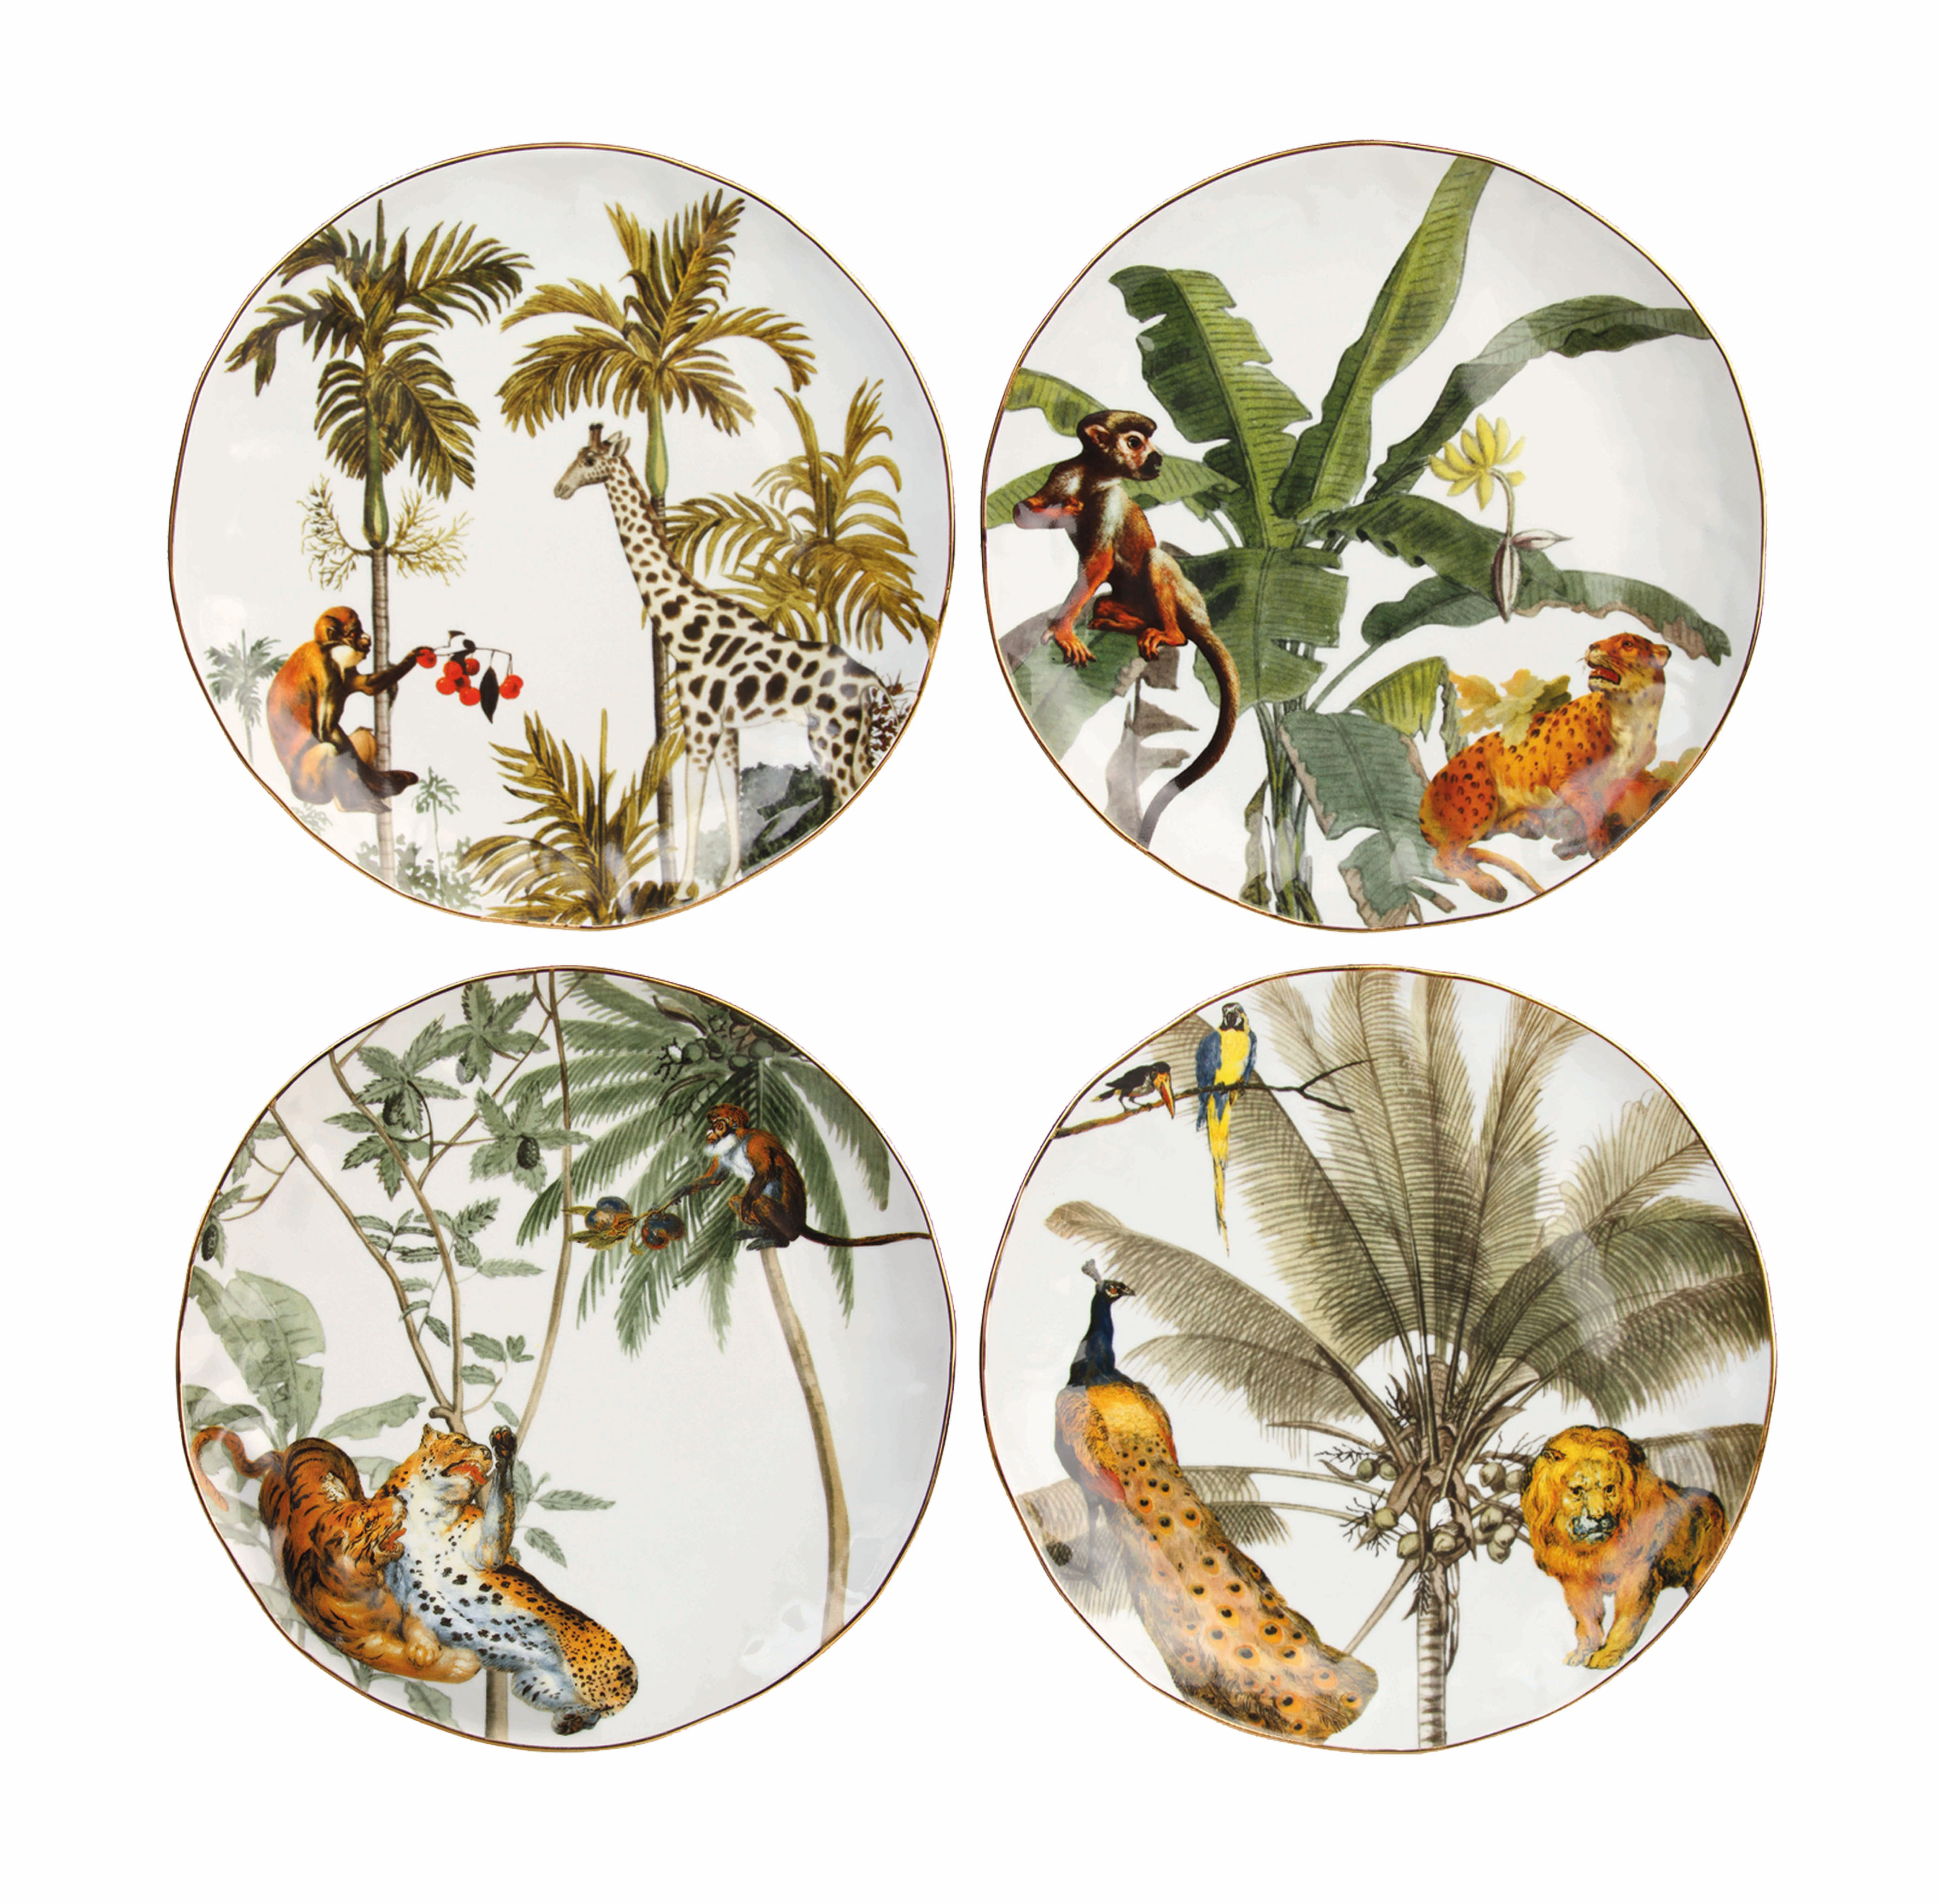 Tableware - Plates - Jungle Plate - / Set of 4 - Porcelain by & klevering - Jungle / Multicoloured - Porcelaine fine